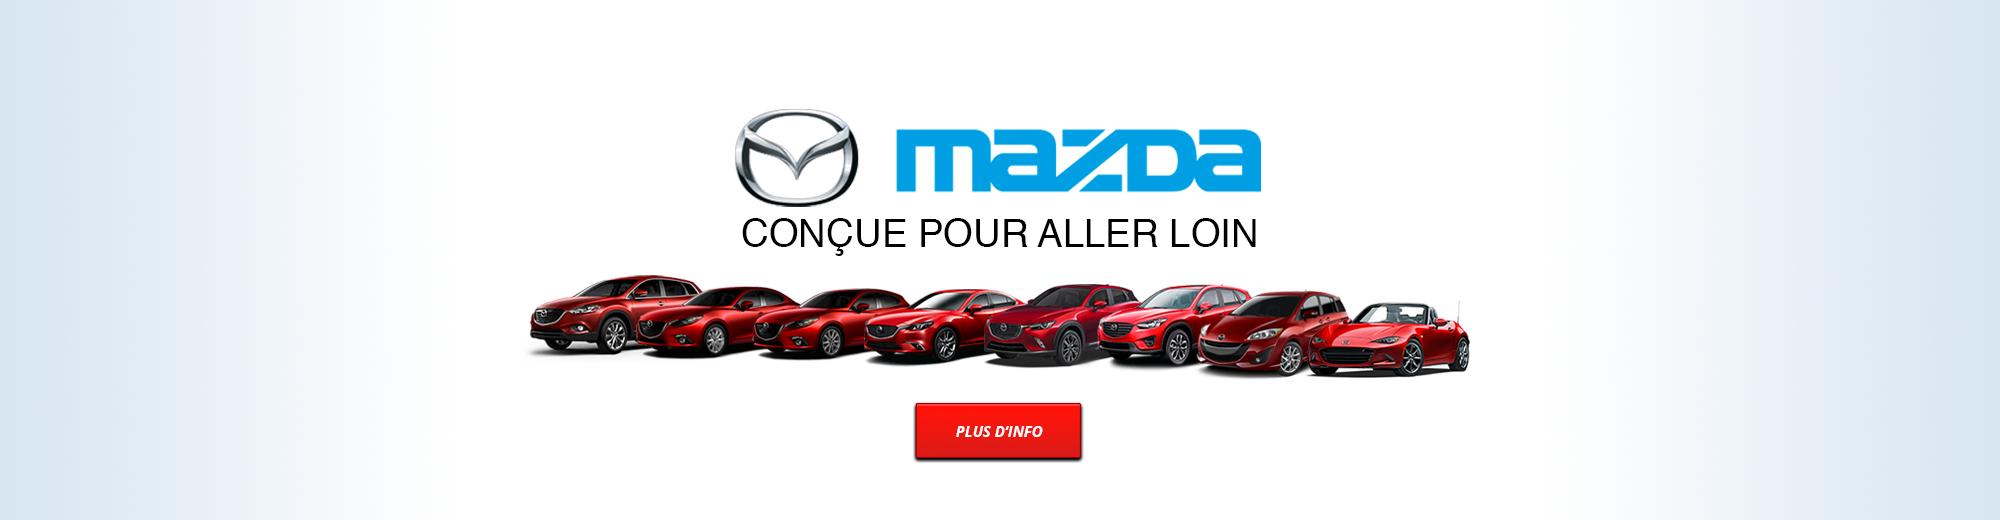 Mazda | Conçue pour aller loin